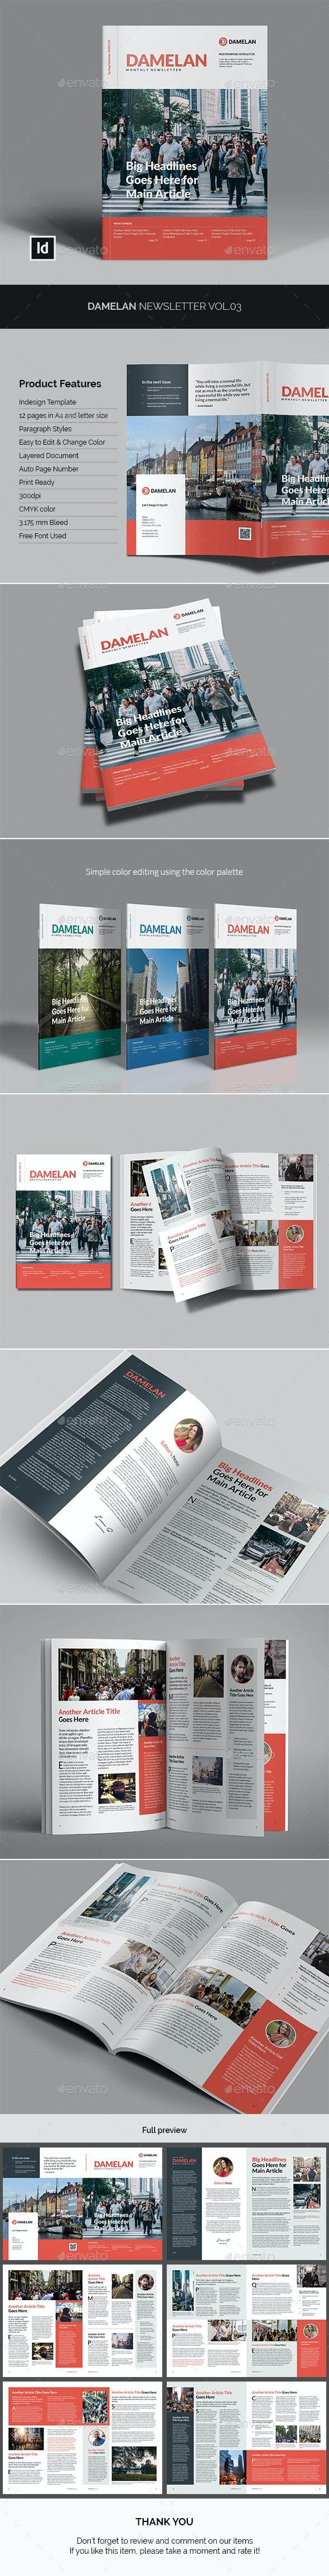 Damelan Newsletter Vol.03 - Newsletters Print Templates